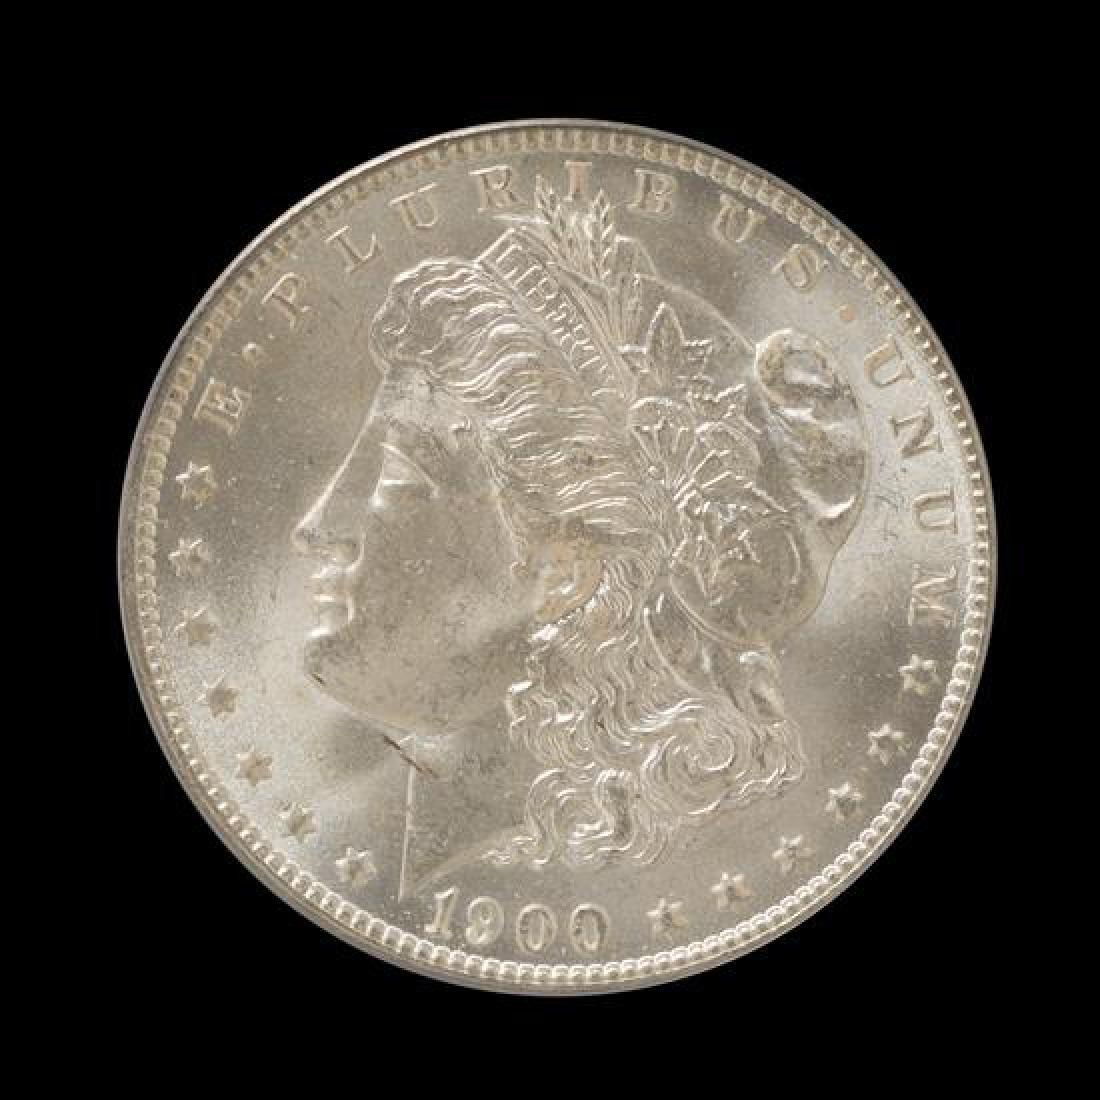 A United States 1900-O Morgan Silver Dollar Coin